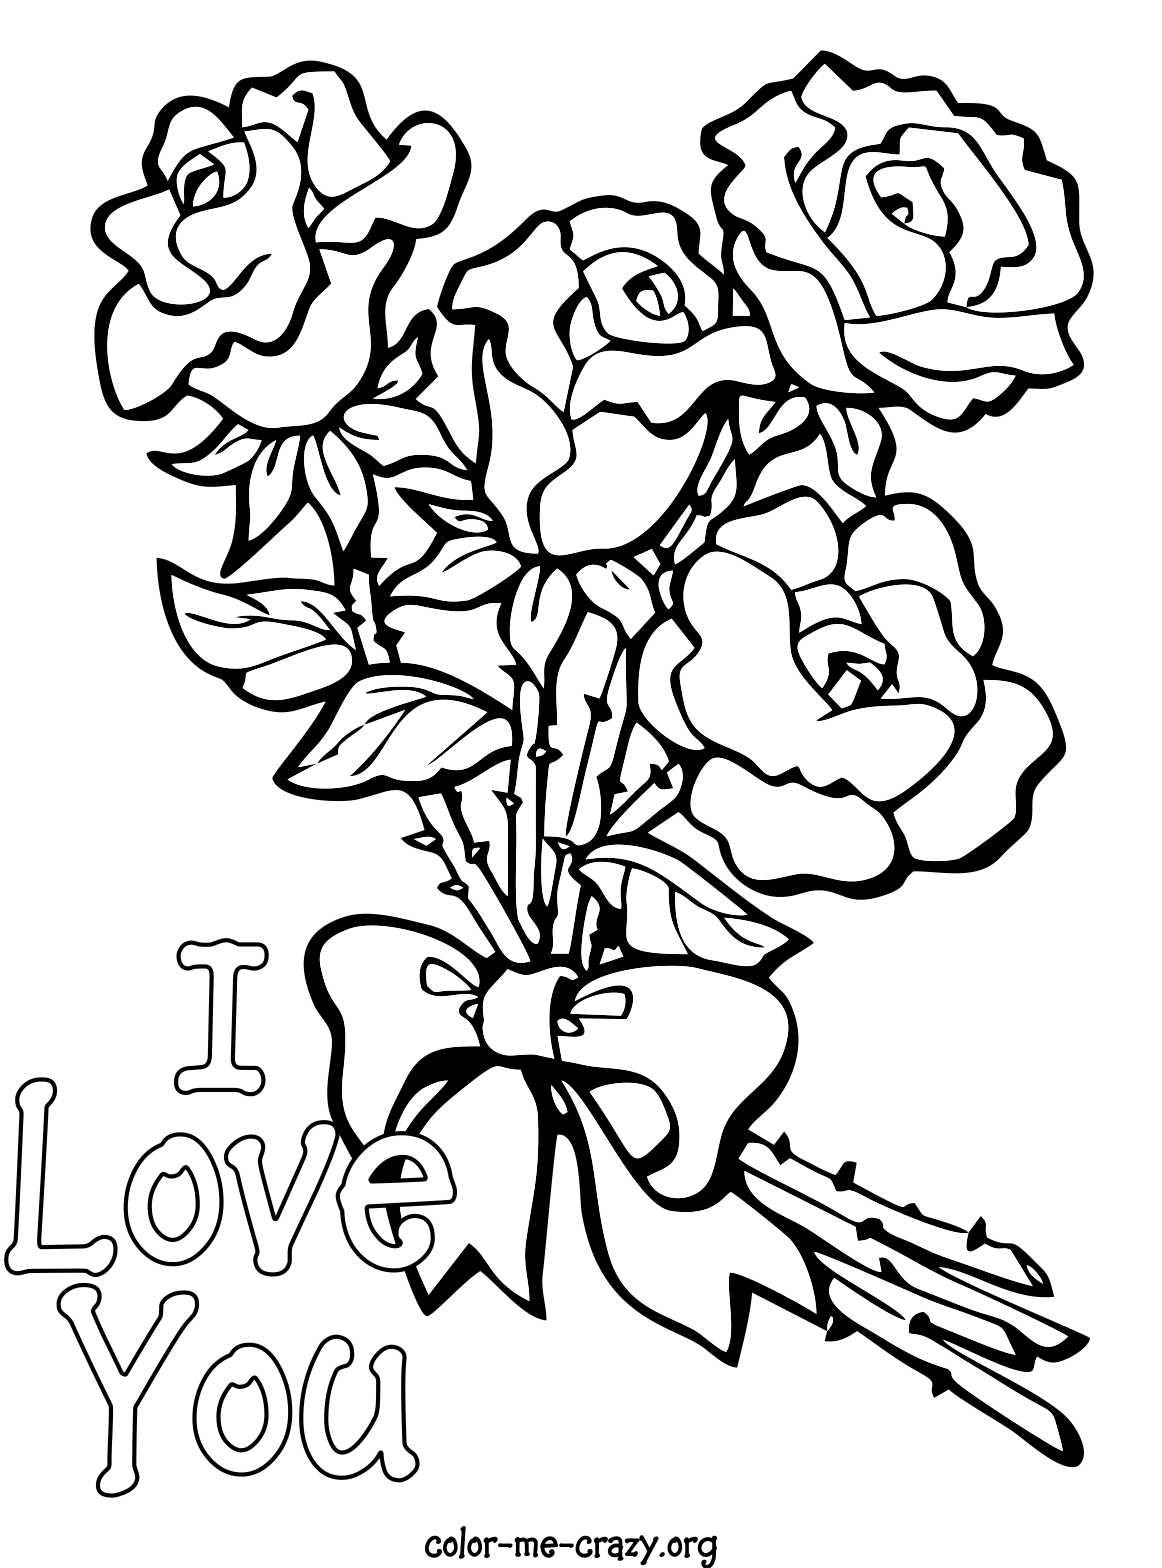 valentines color pages colormecrazyorg valentine coloring pages pages valentines color